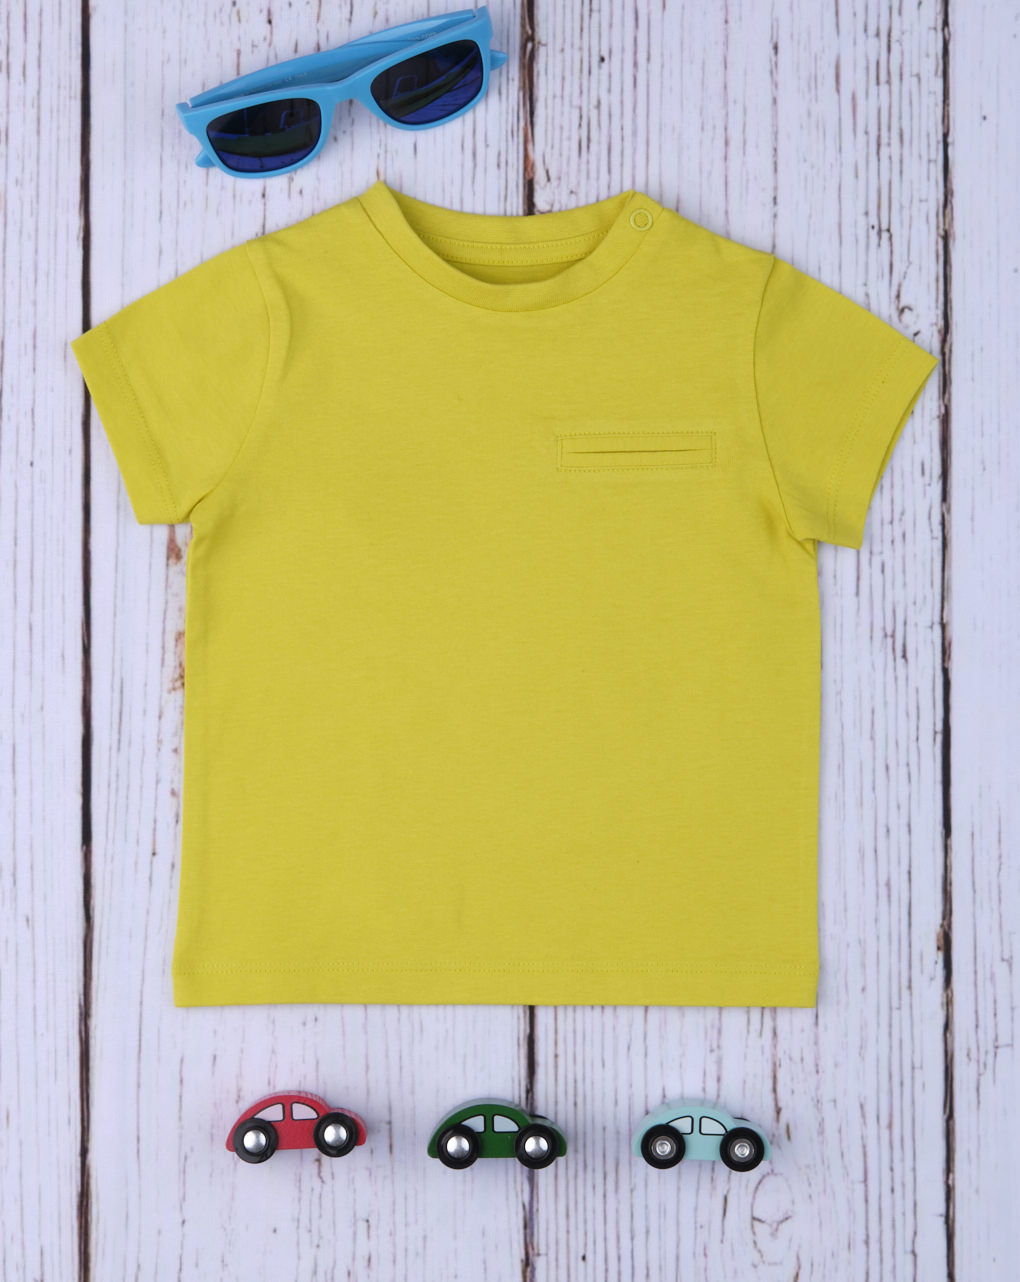 T-shirt boy yellow - Prénatal